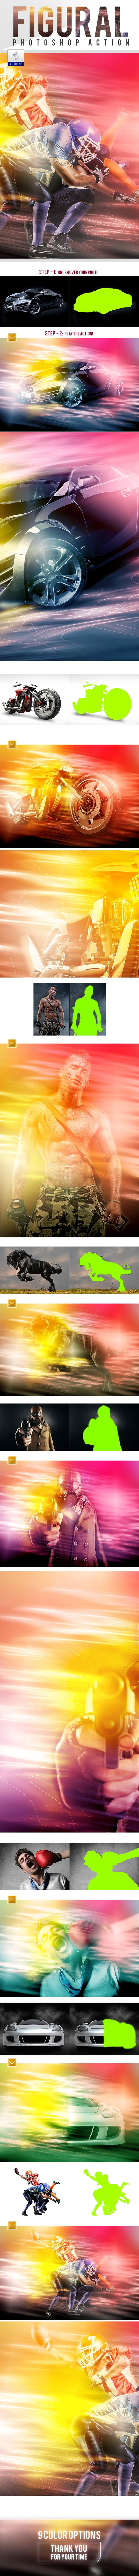 Figural Photoshop Action - Actions Photoshop